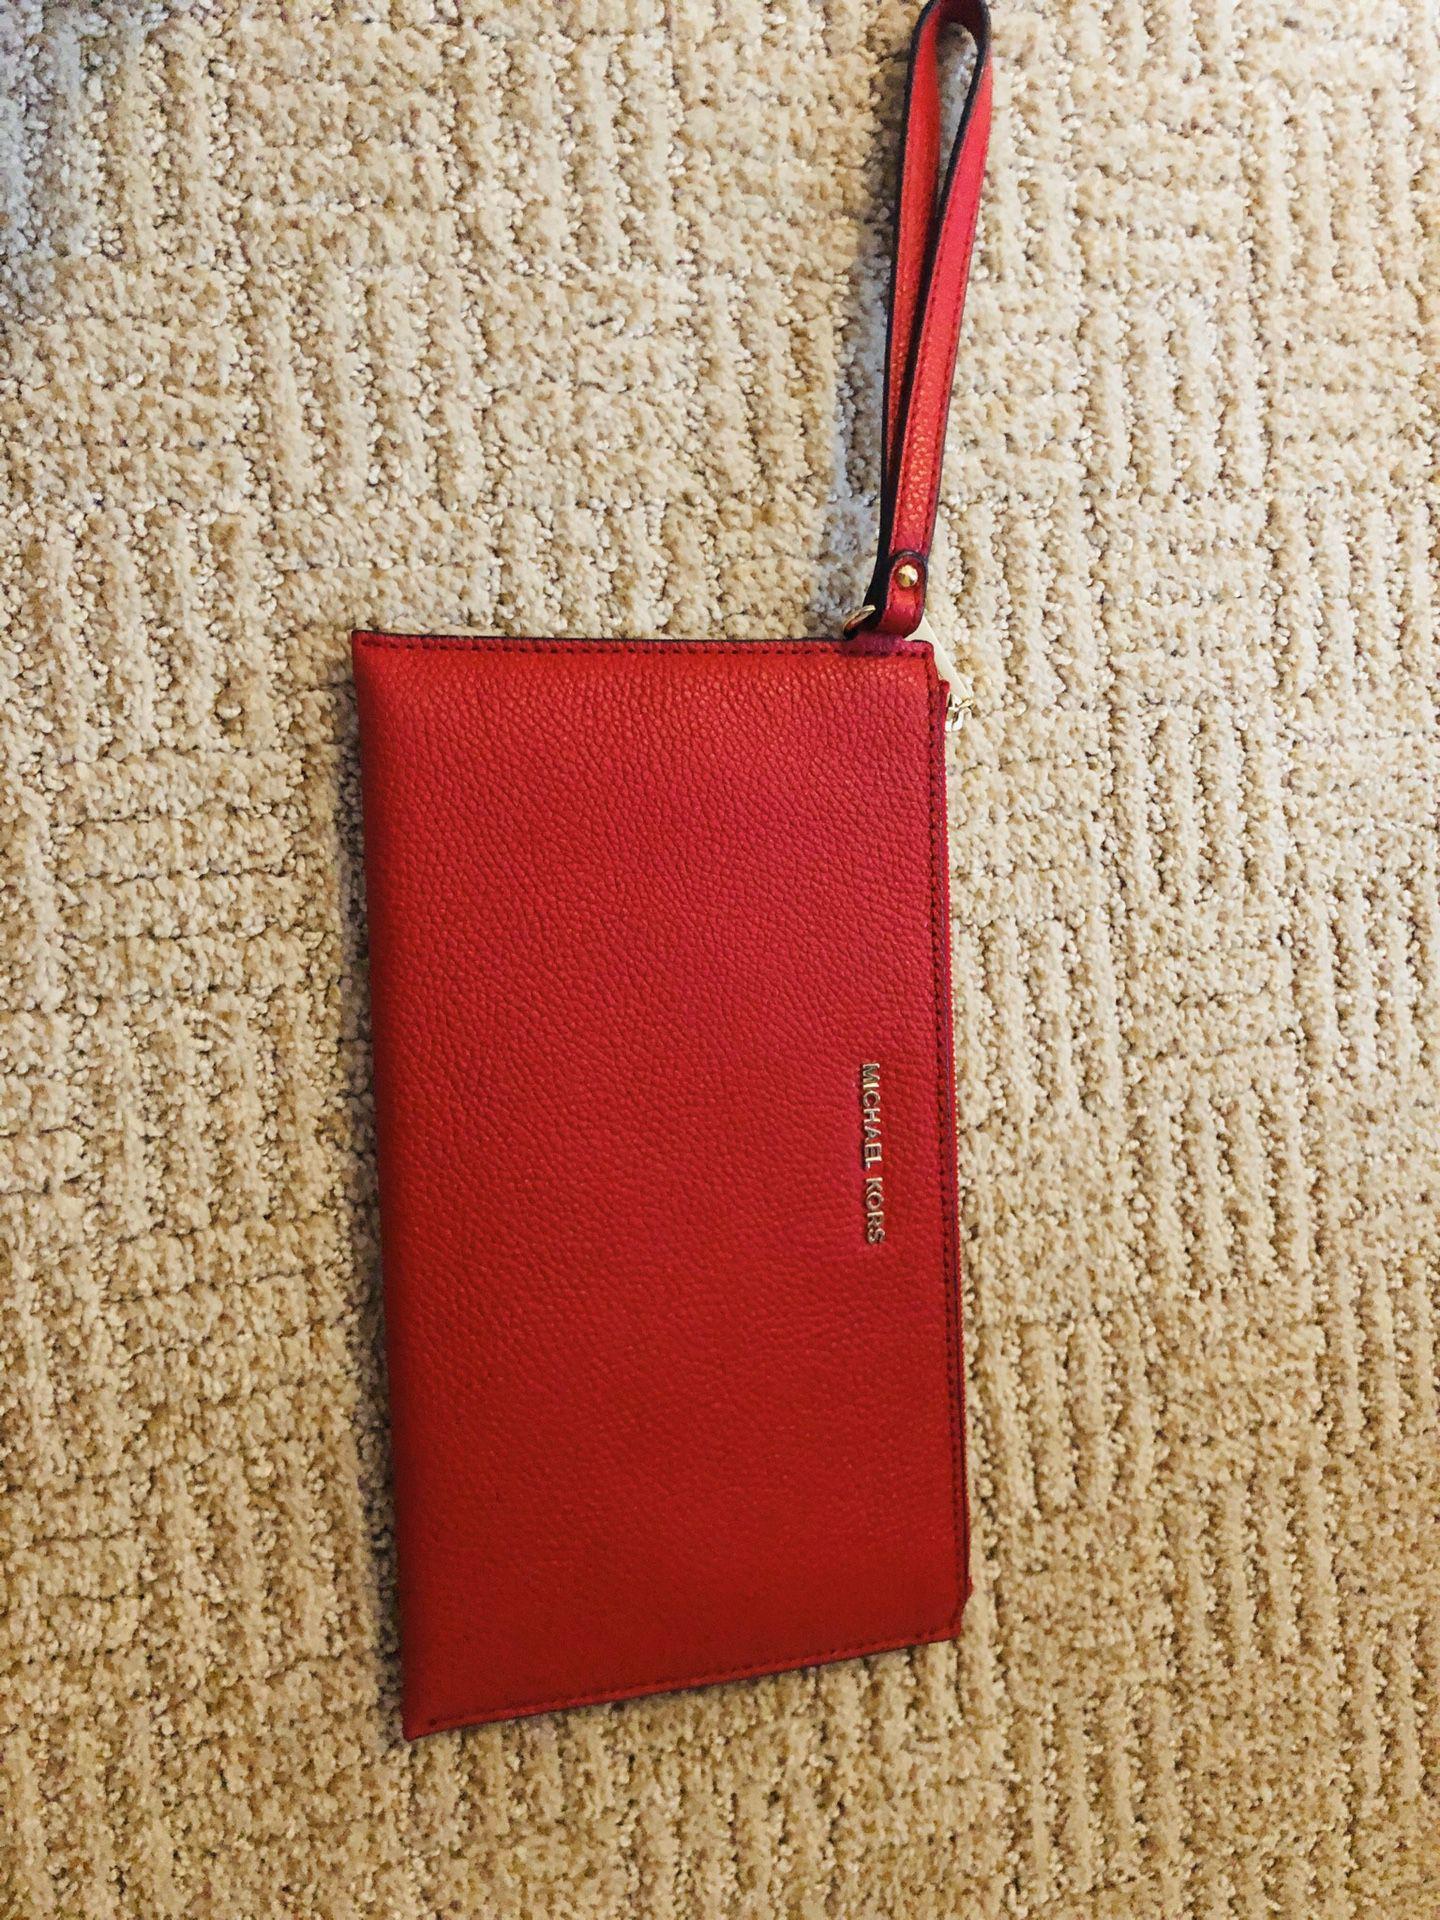 Michael Kors read wristlet/pouch